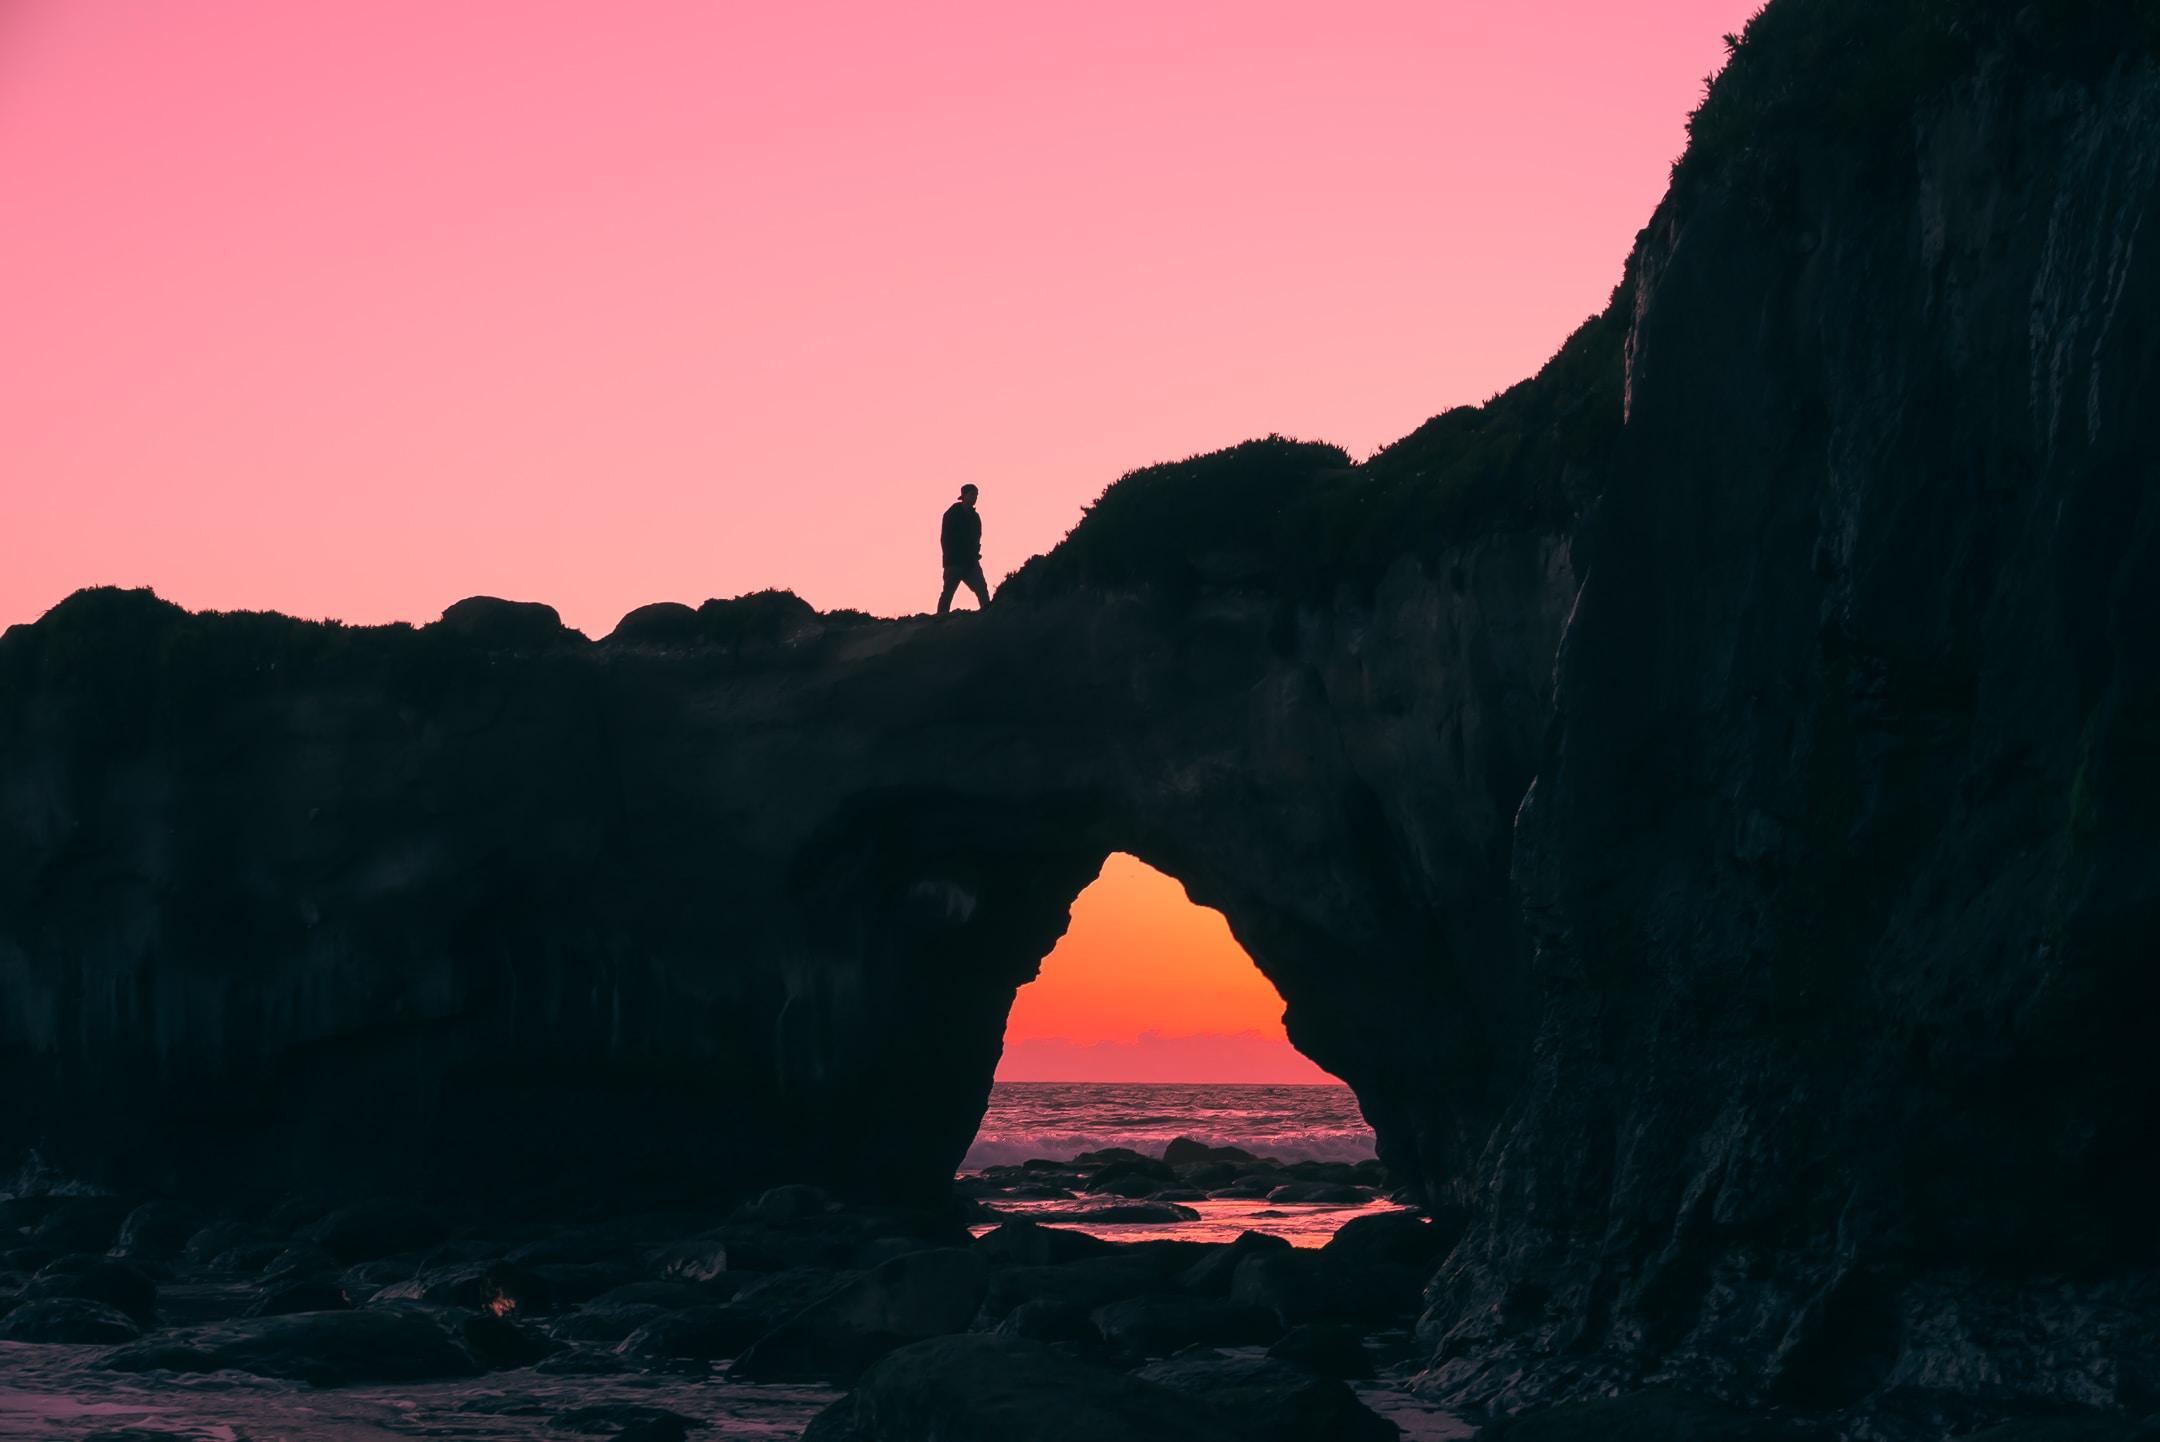 silhouette of man walking on top of large rock